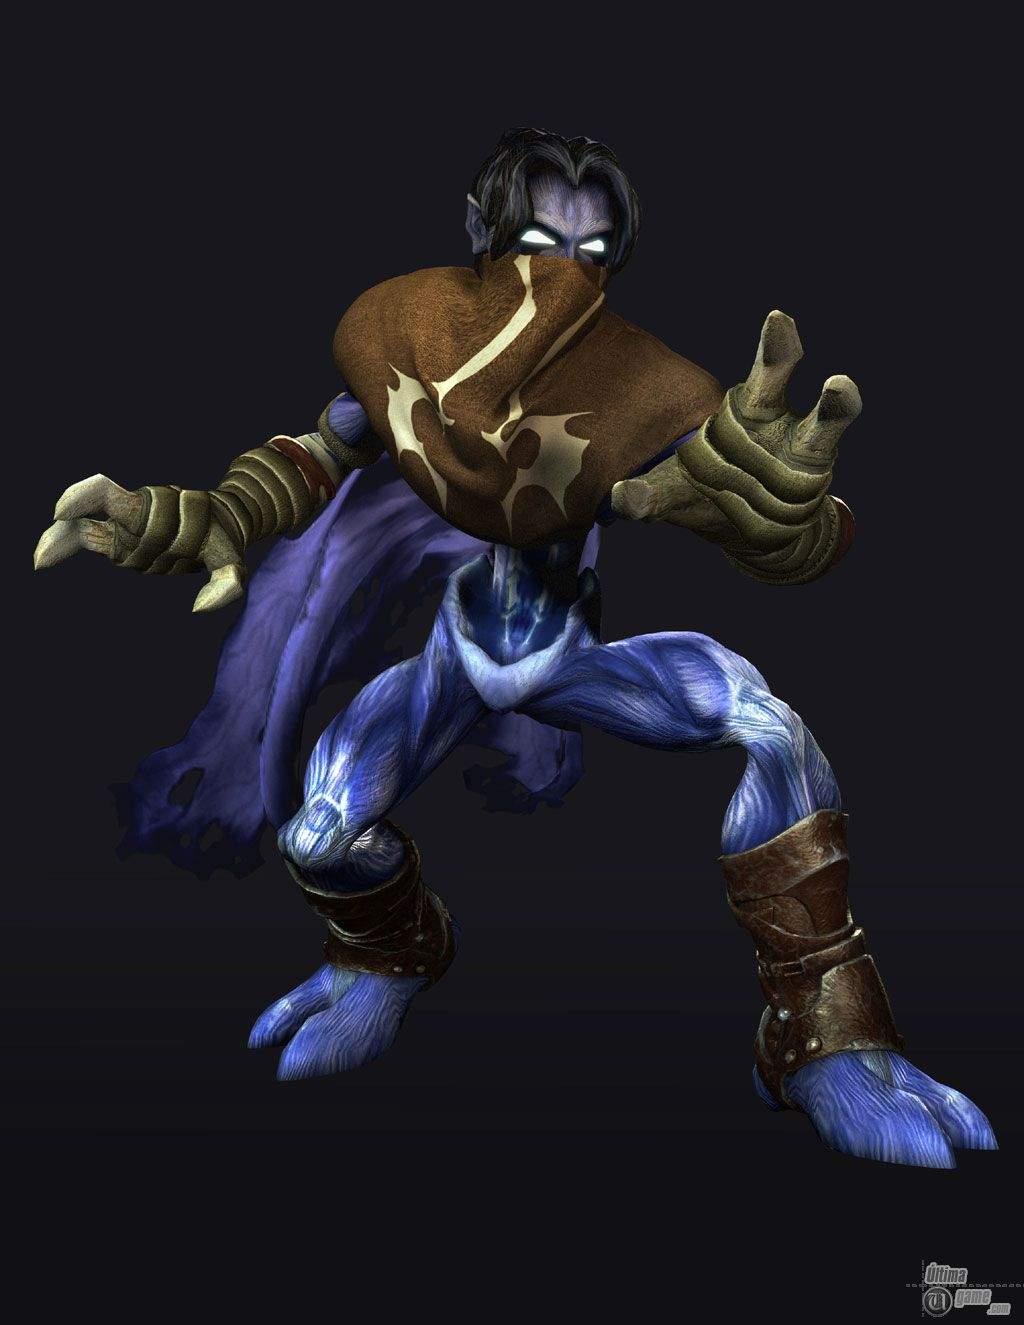 Imágenes de Legacy of Kain: Defiance: Legacy of Kain